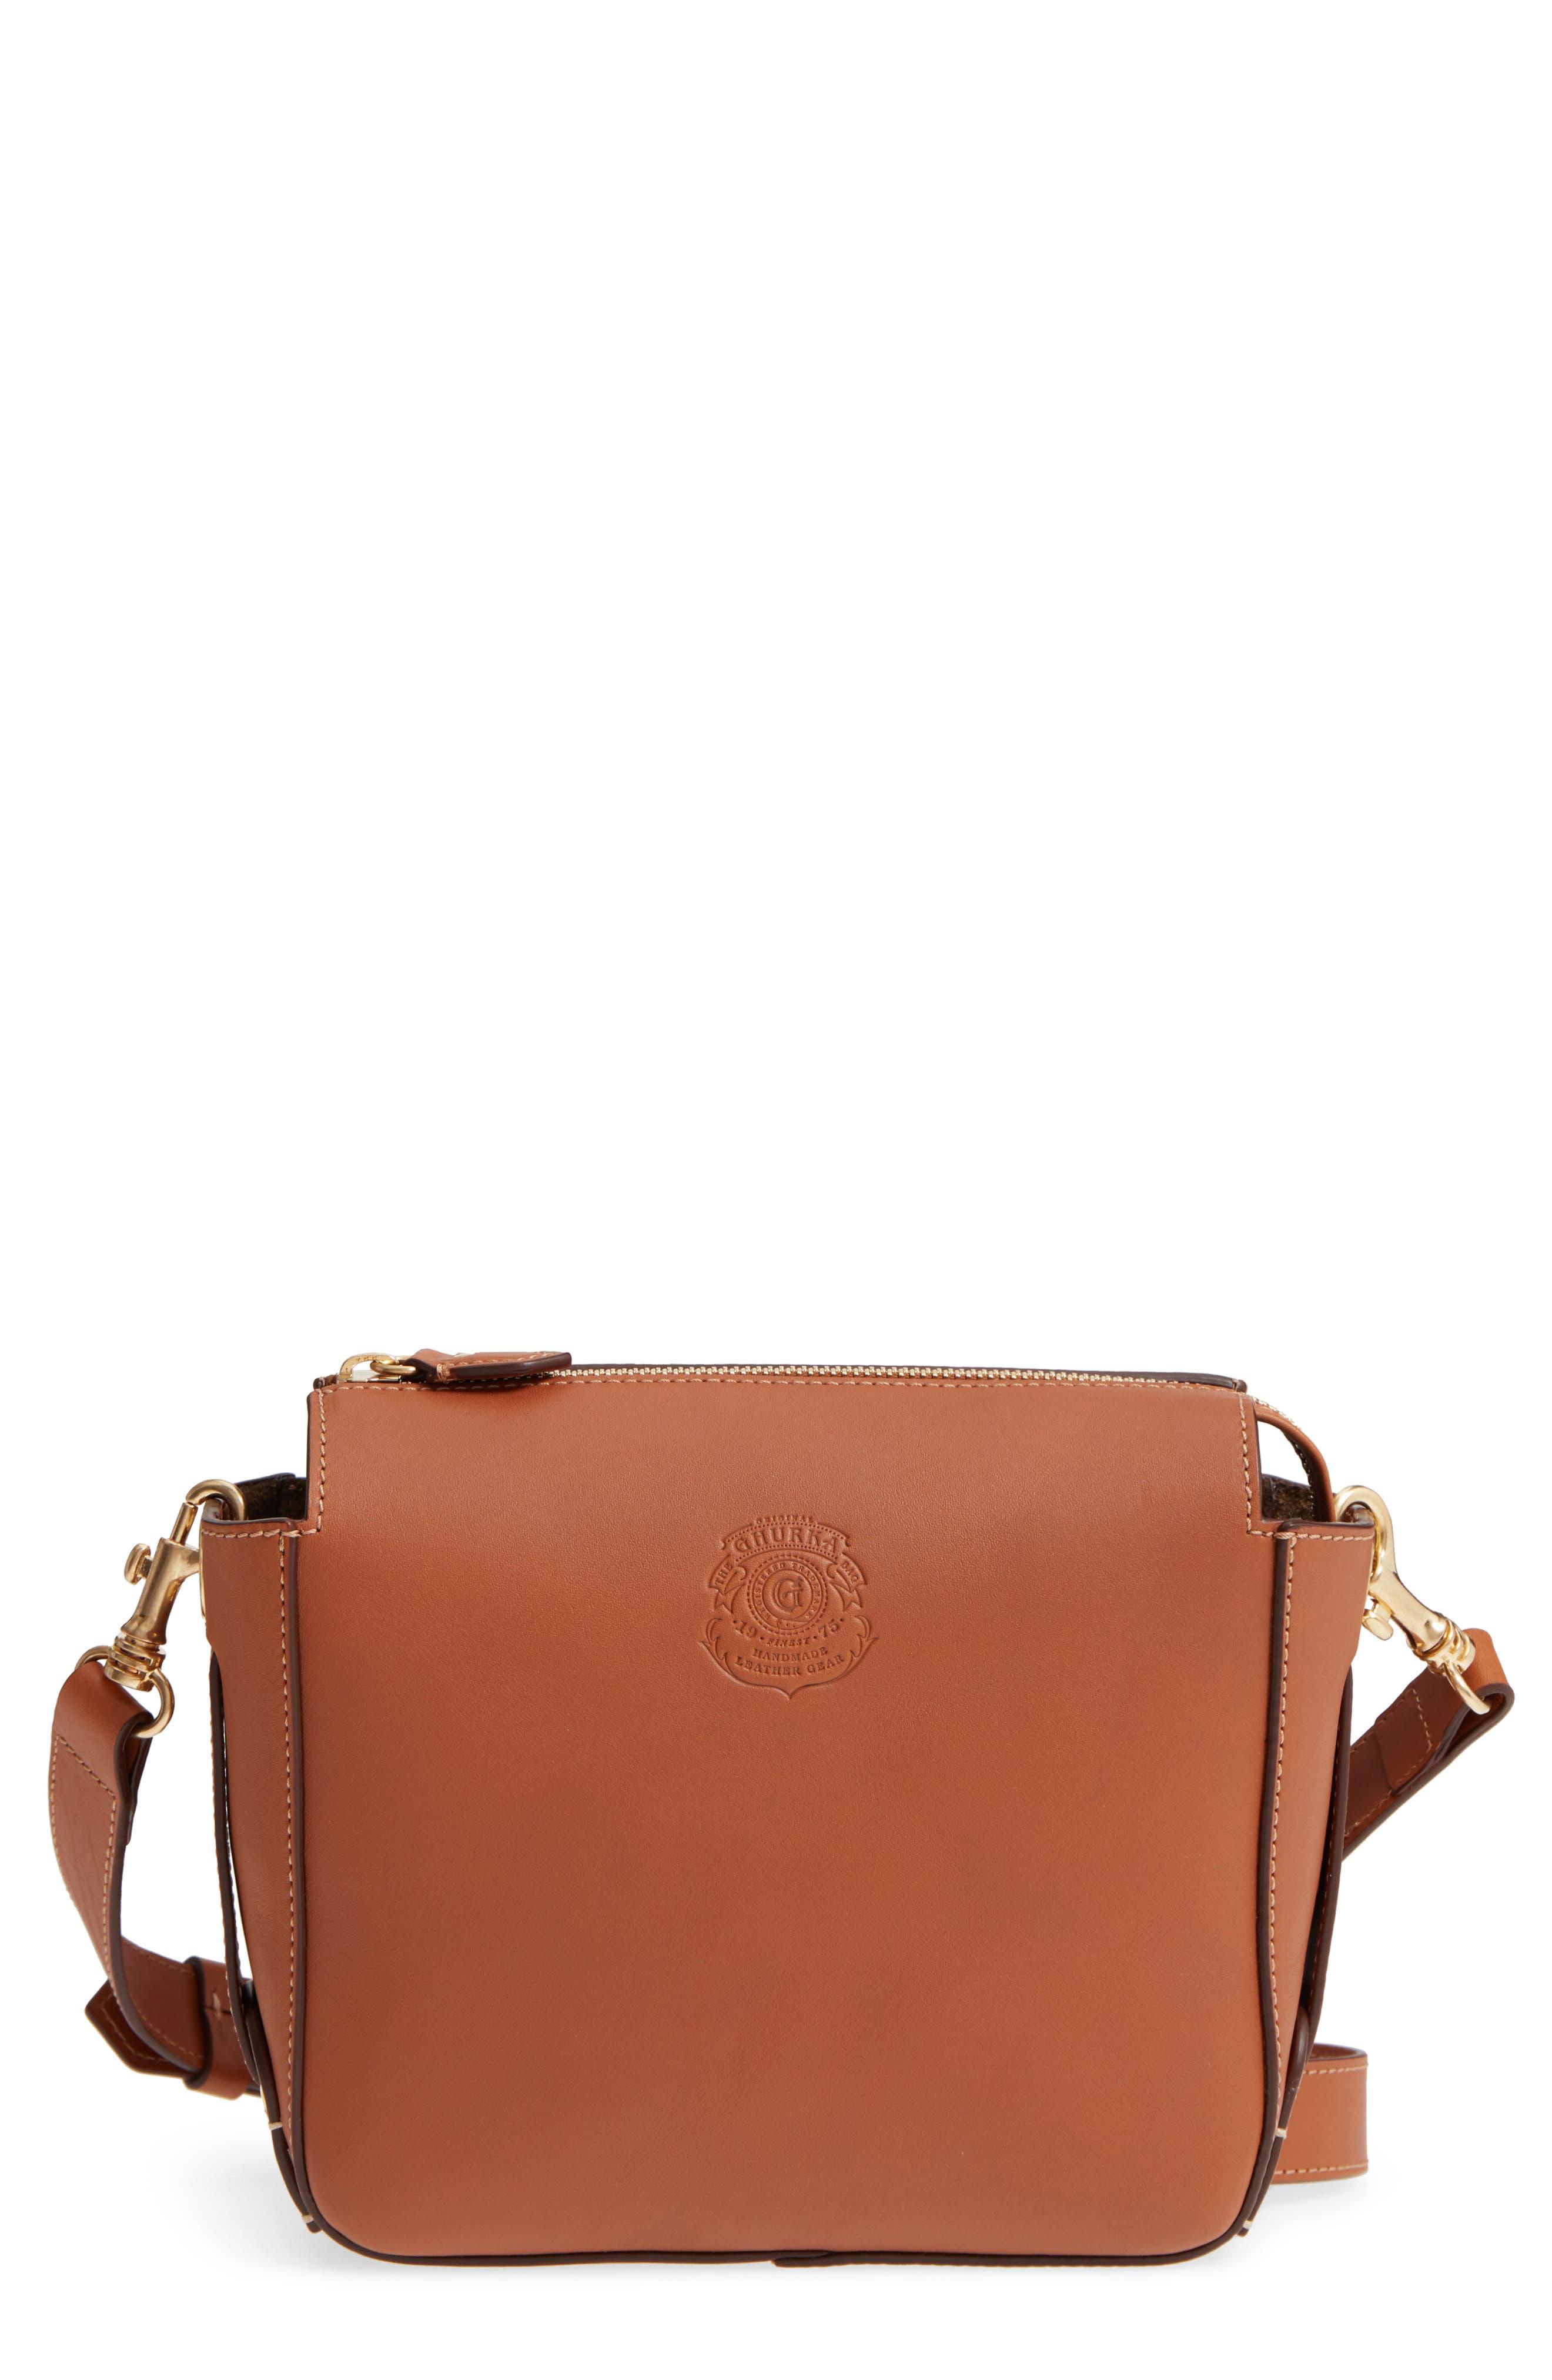 Ghurka Tilley Leather Crossbody Bag